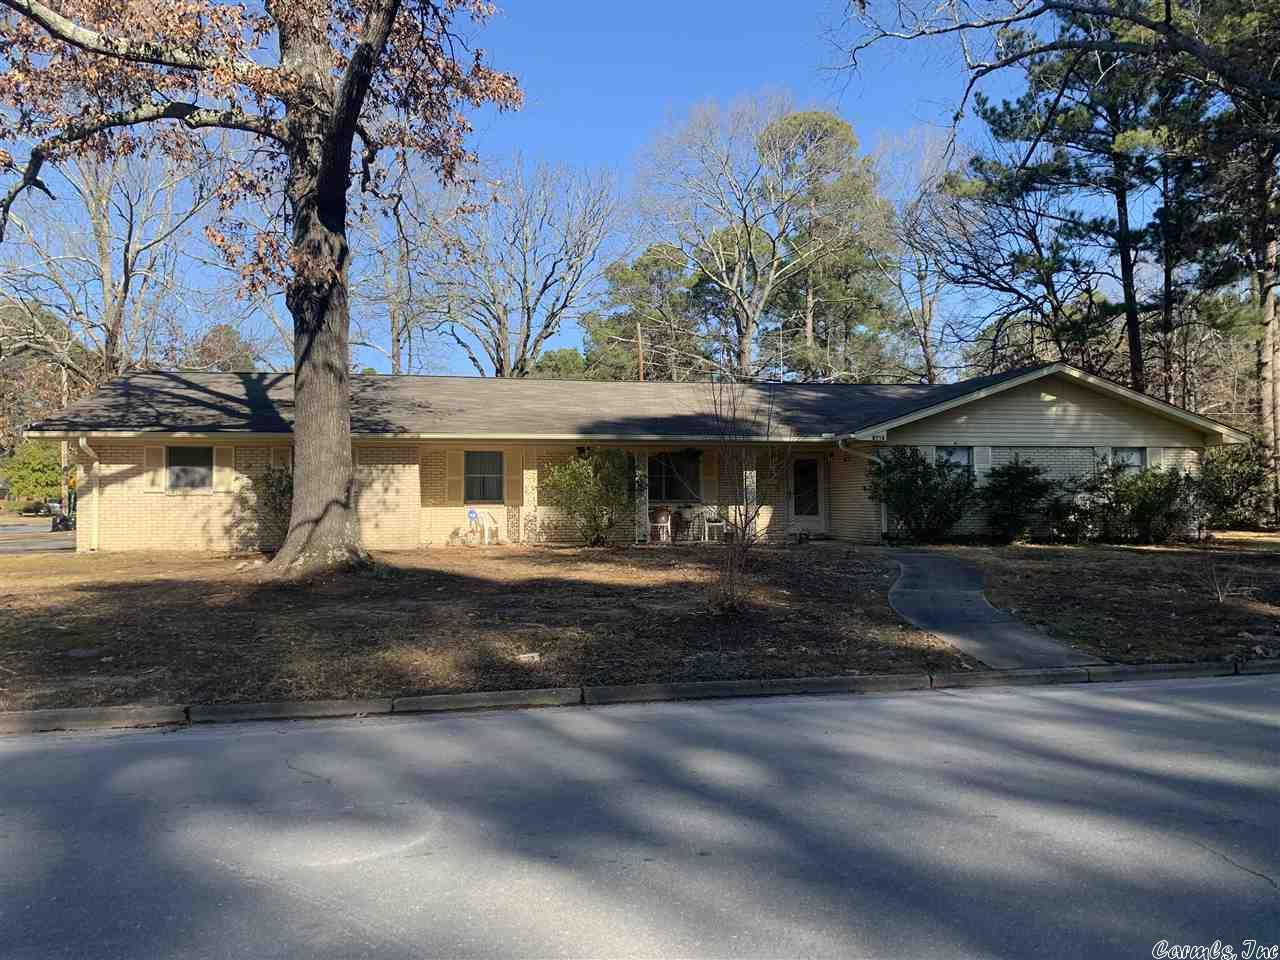 2713 Sherwood Forest, Pine Bluff, AR 71603